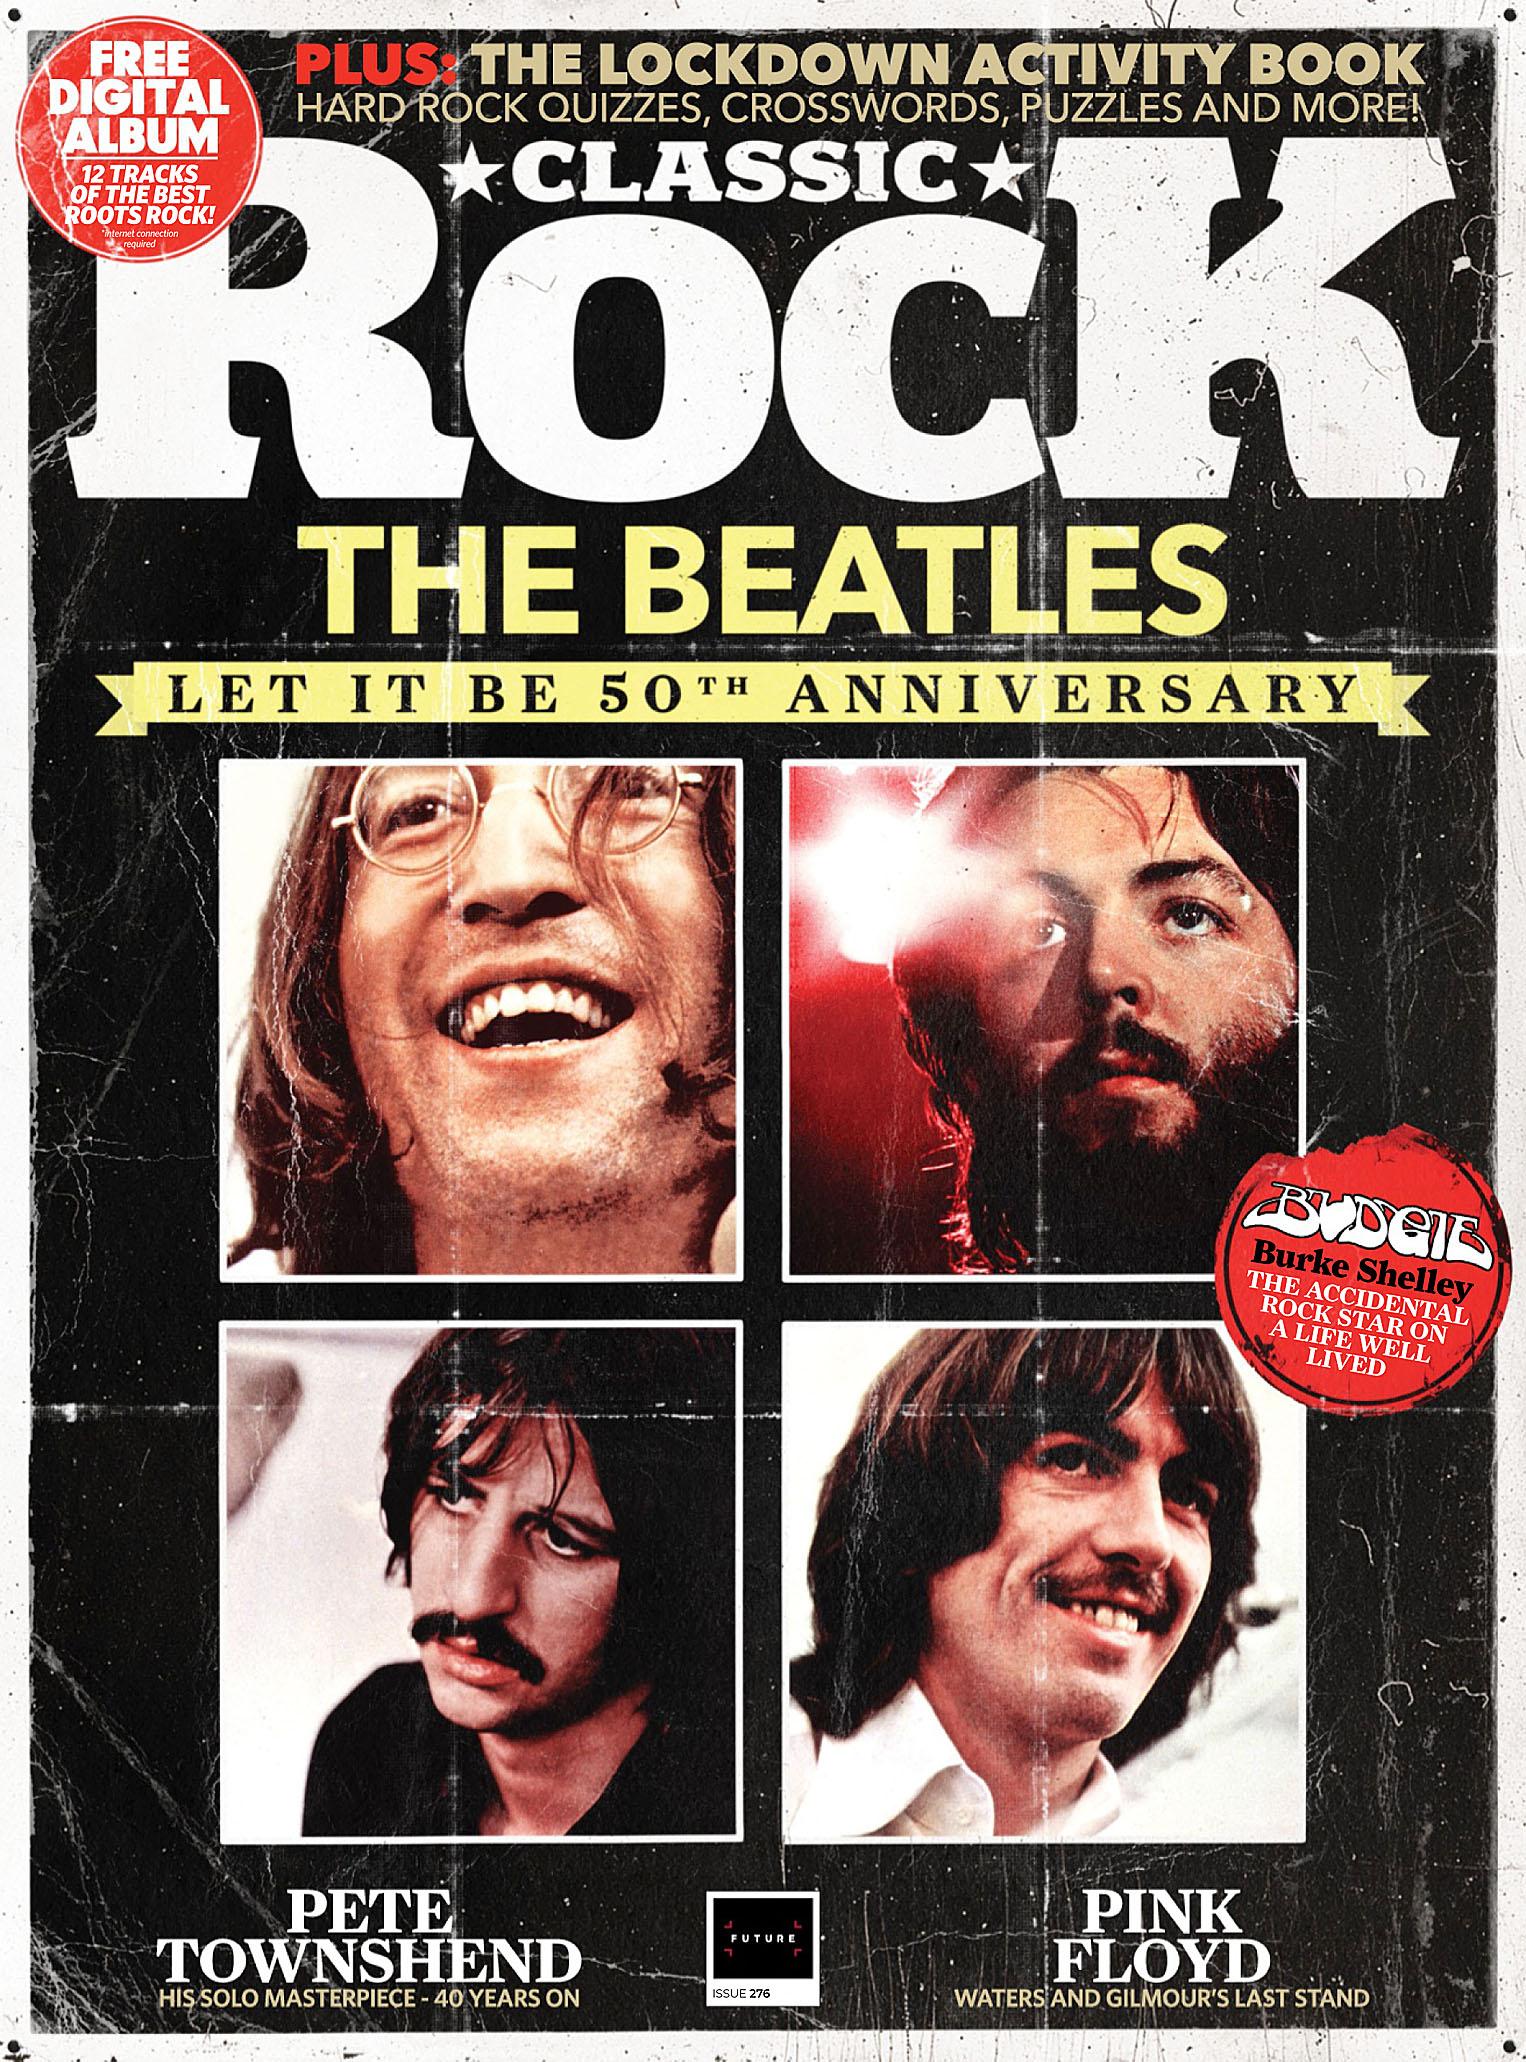 Classic Rock UK 2020-07 Beatles 01.jpg